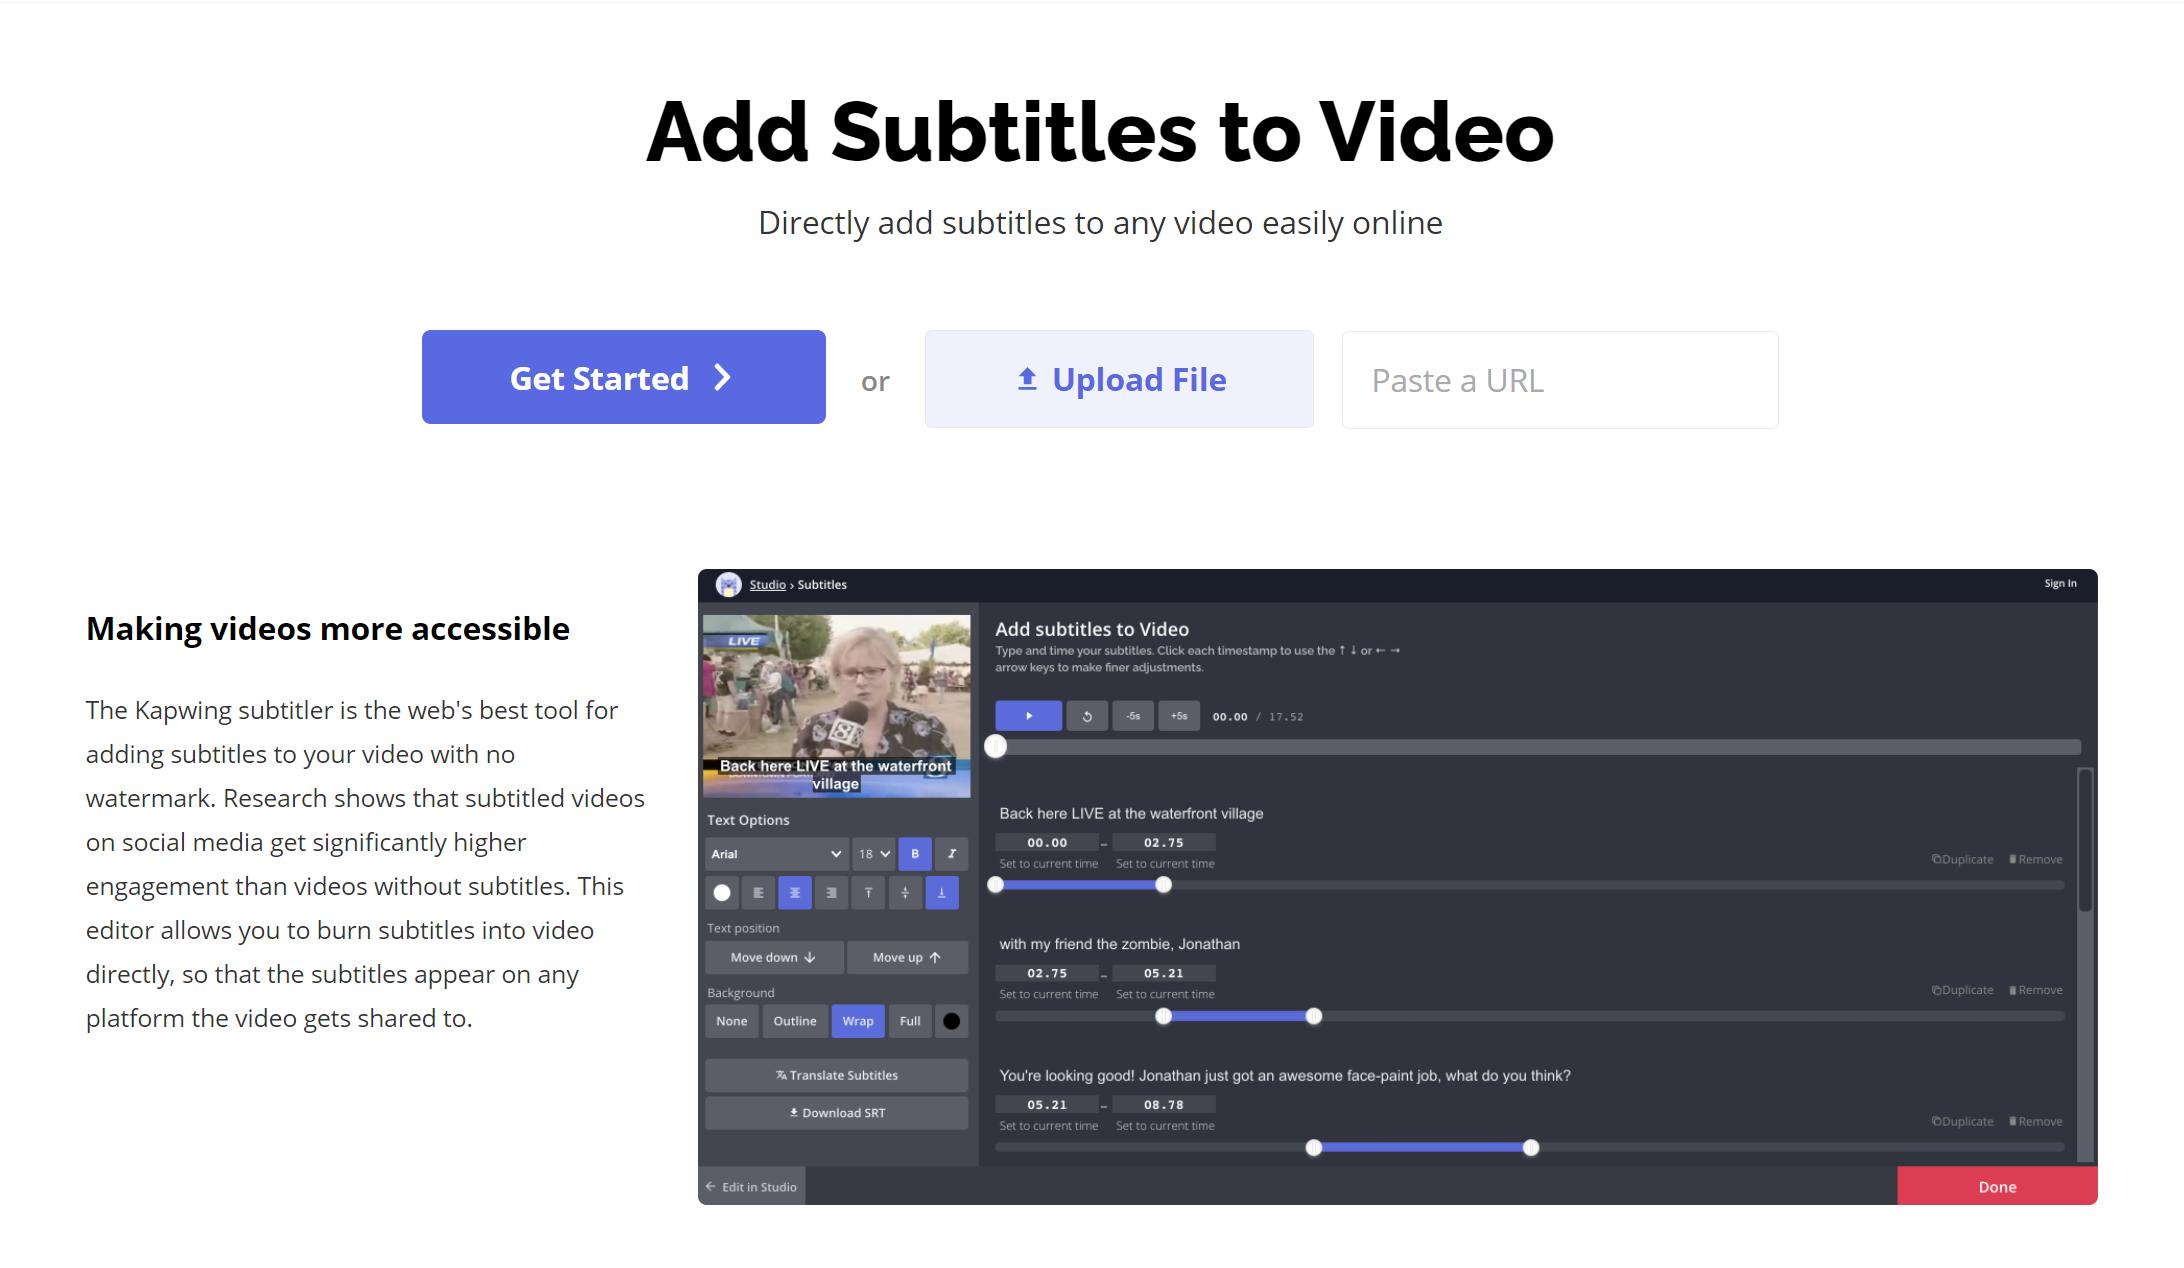 Add Subtitles to Video on iPad on Kapwing